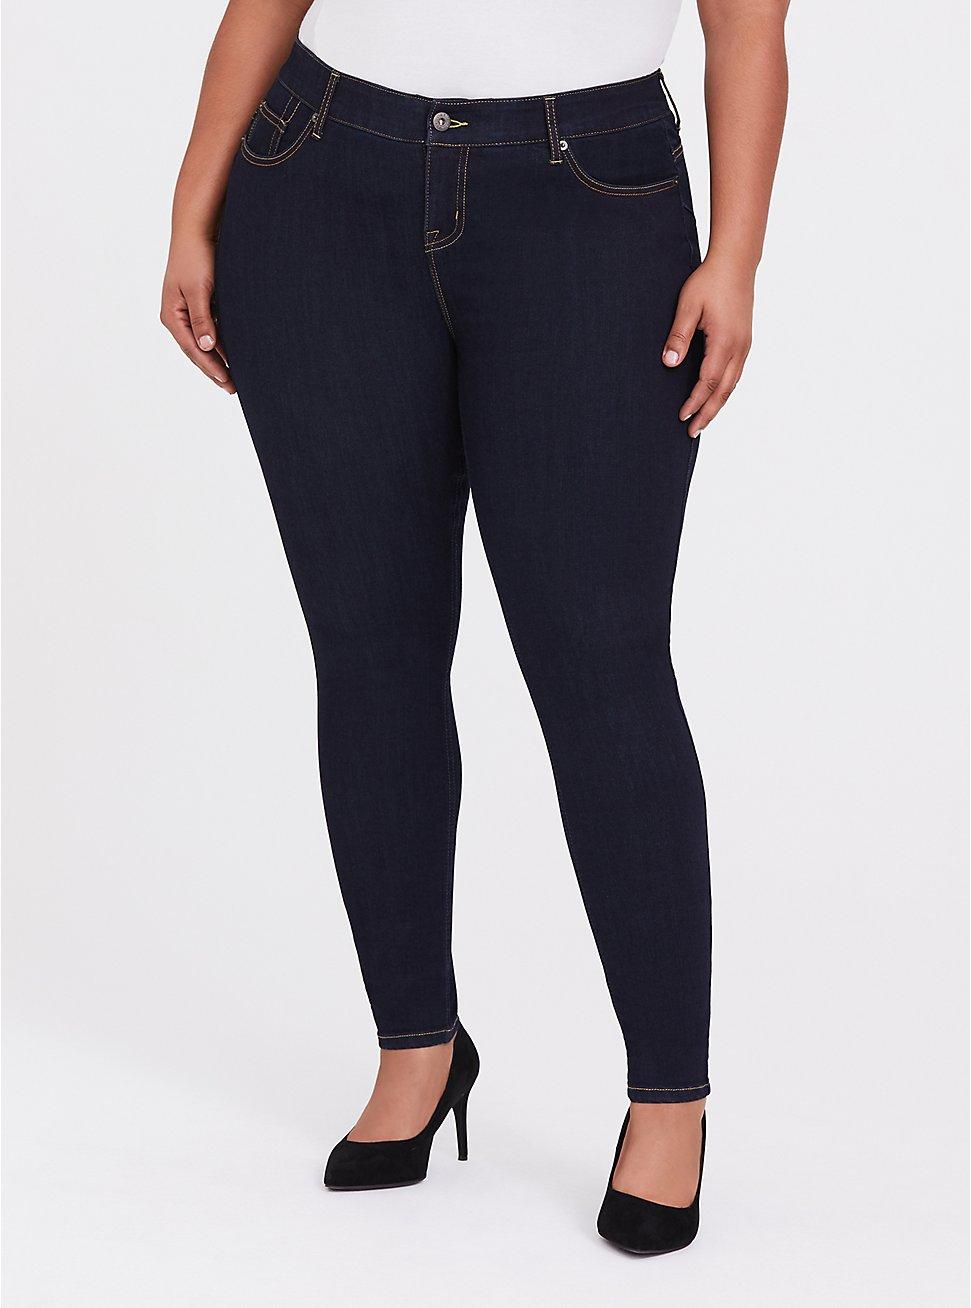 Bombshell Skinny Jean - Premium Stretch Dark Wash, , hi-res